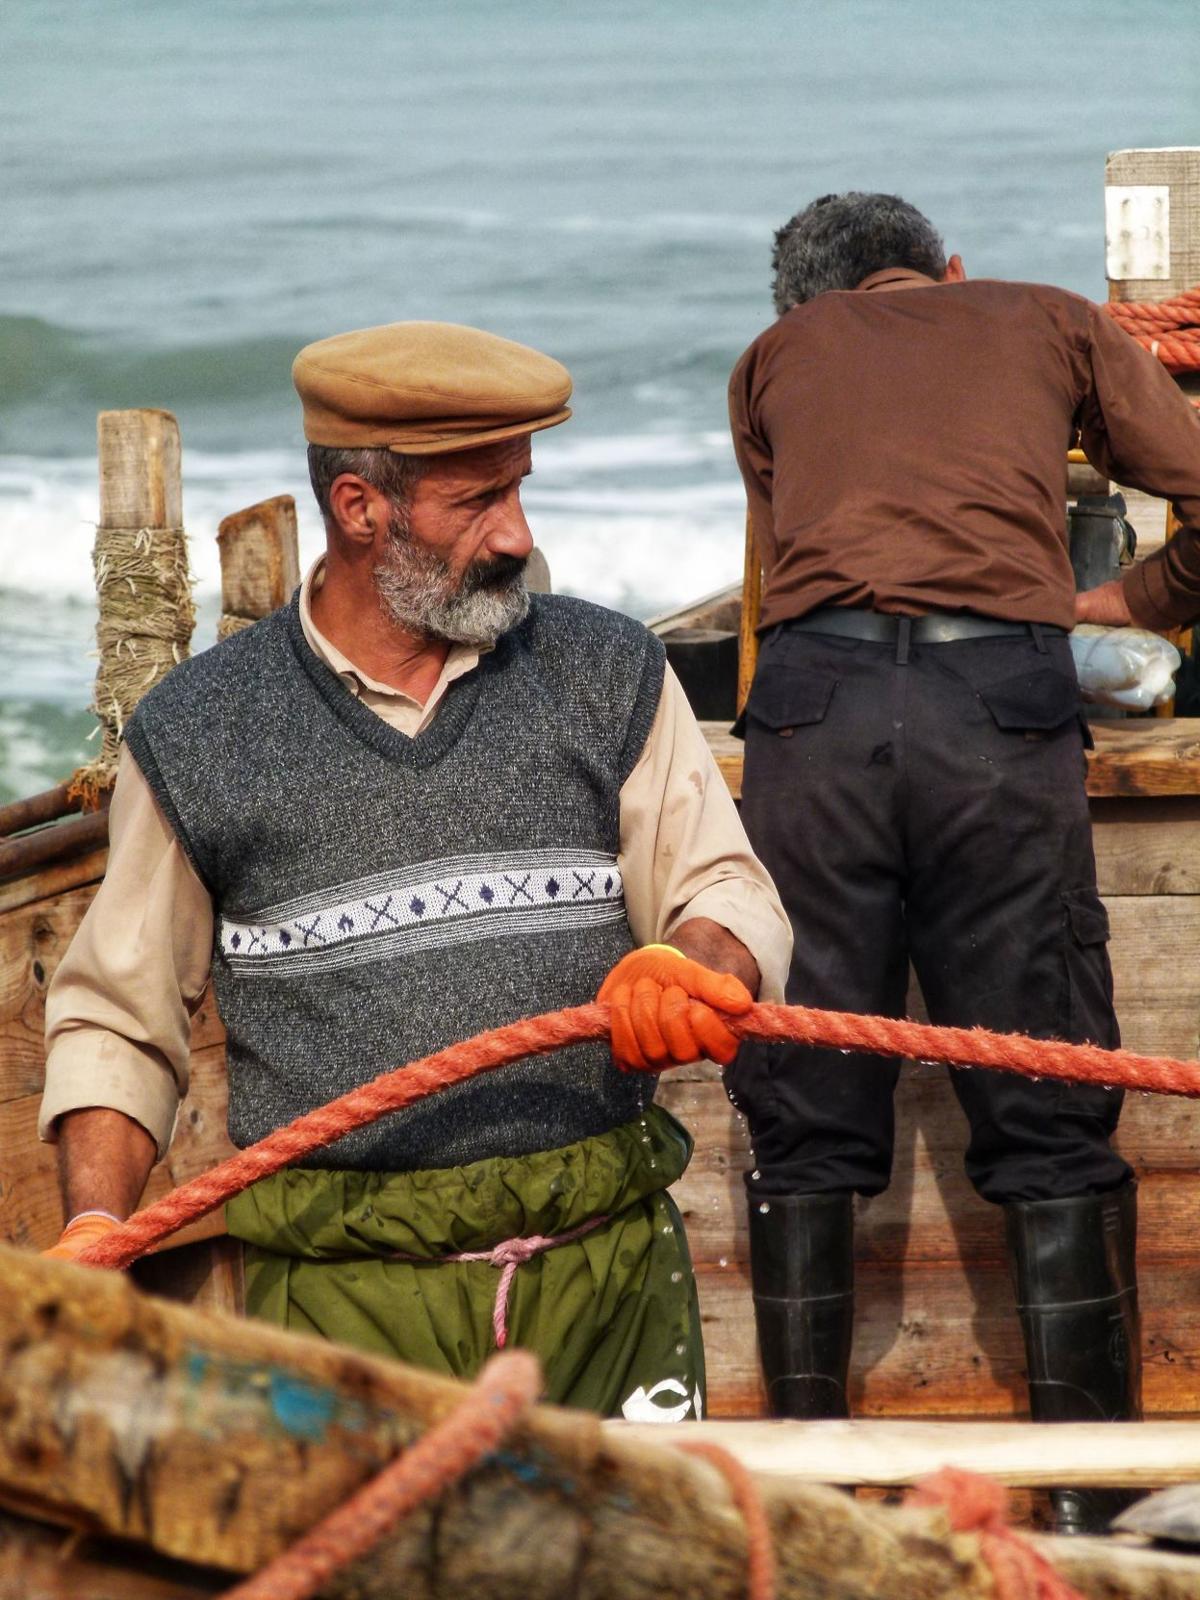 Fisherman in Ziba Kenar